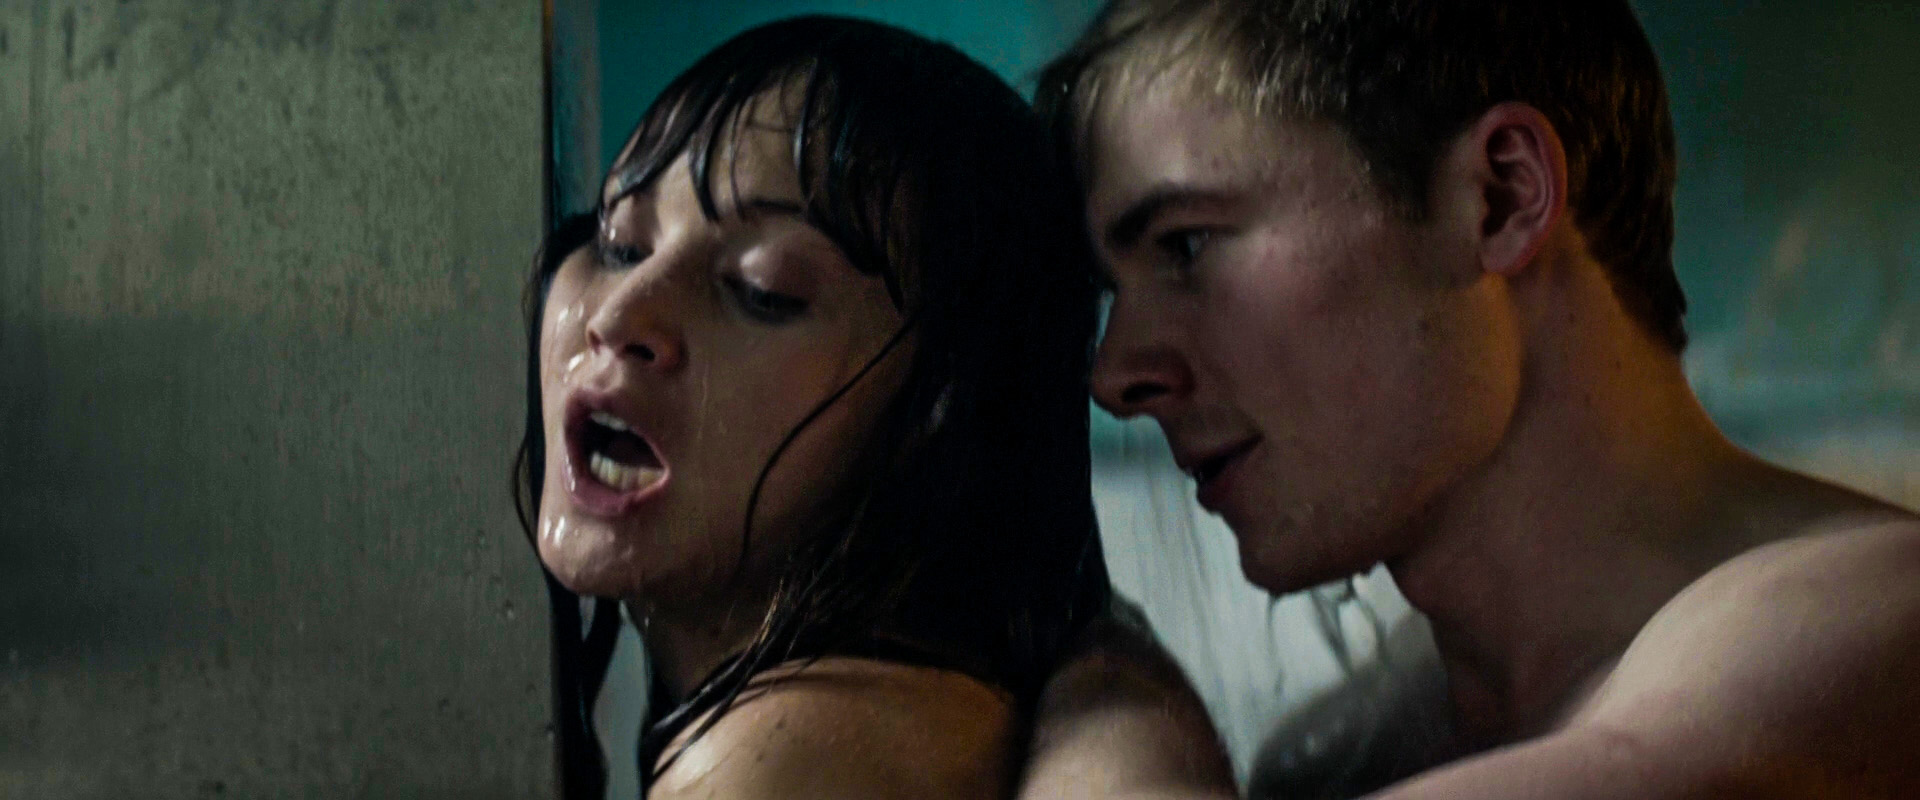 Forced sex scene